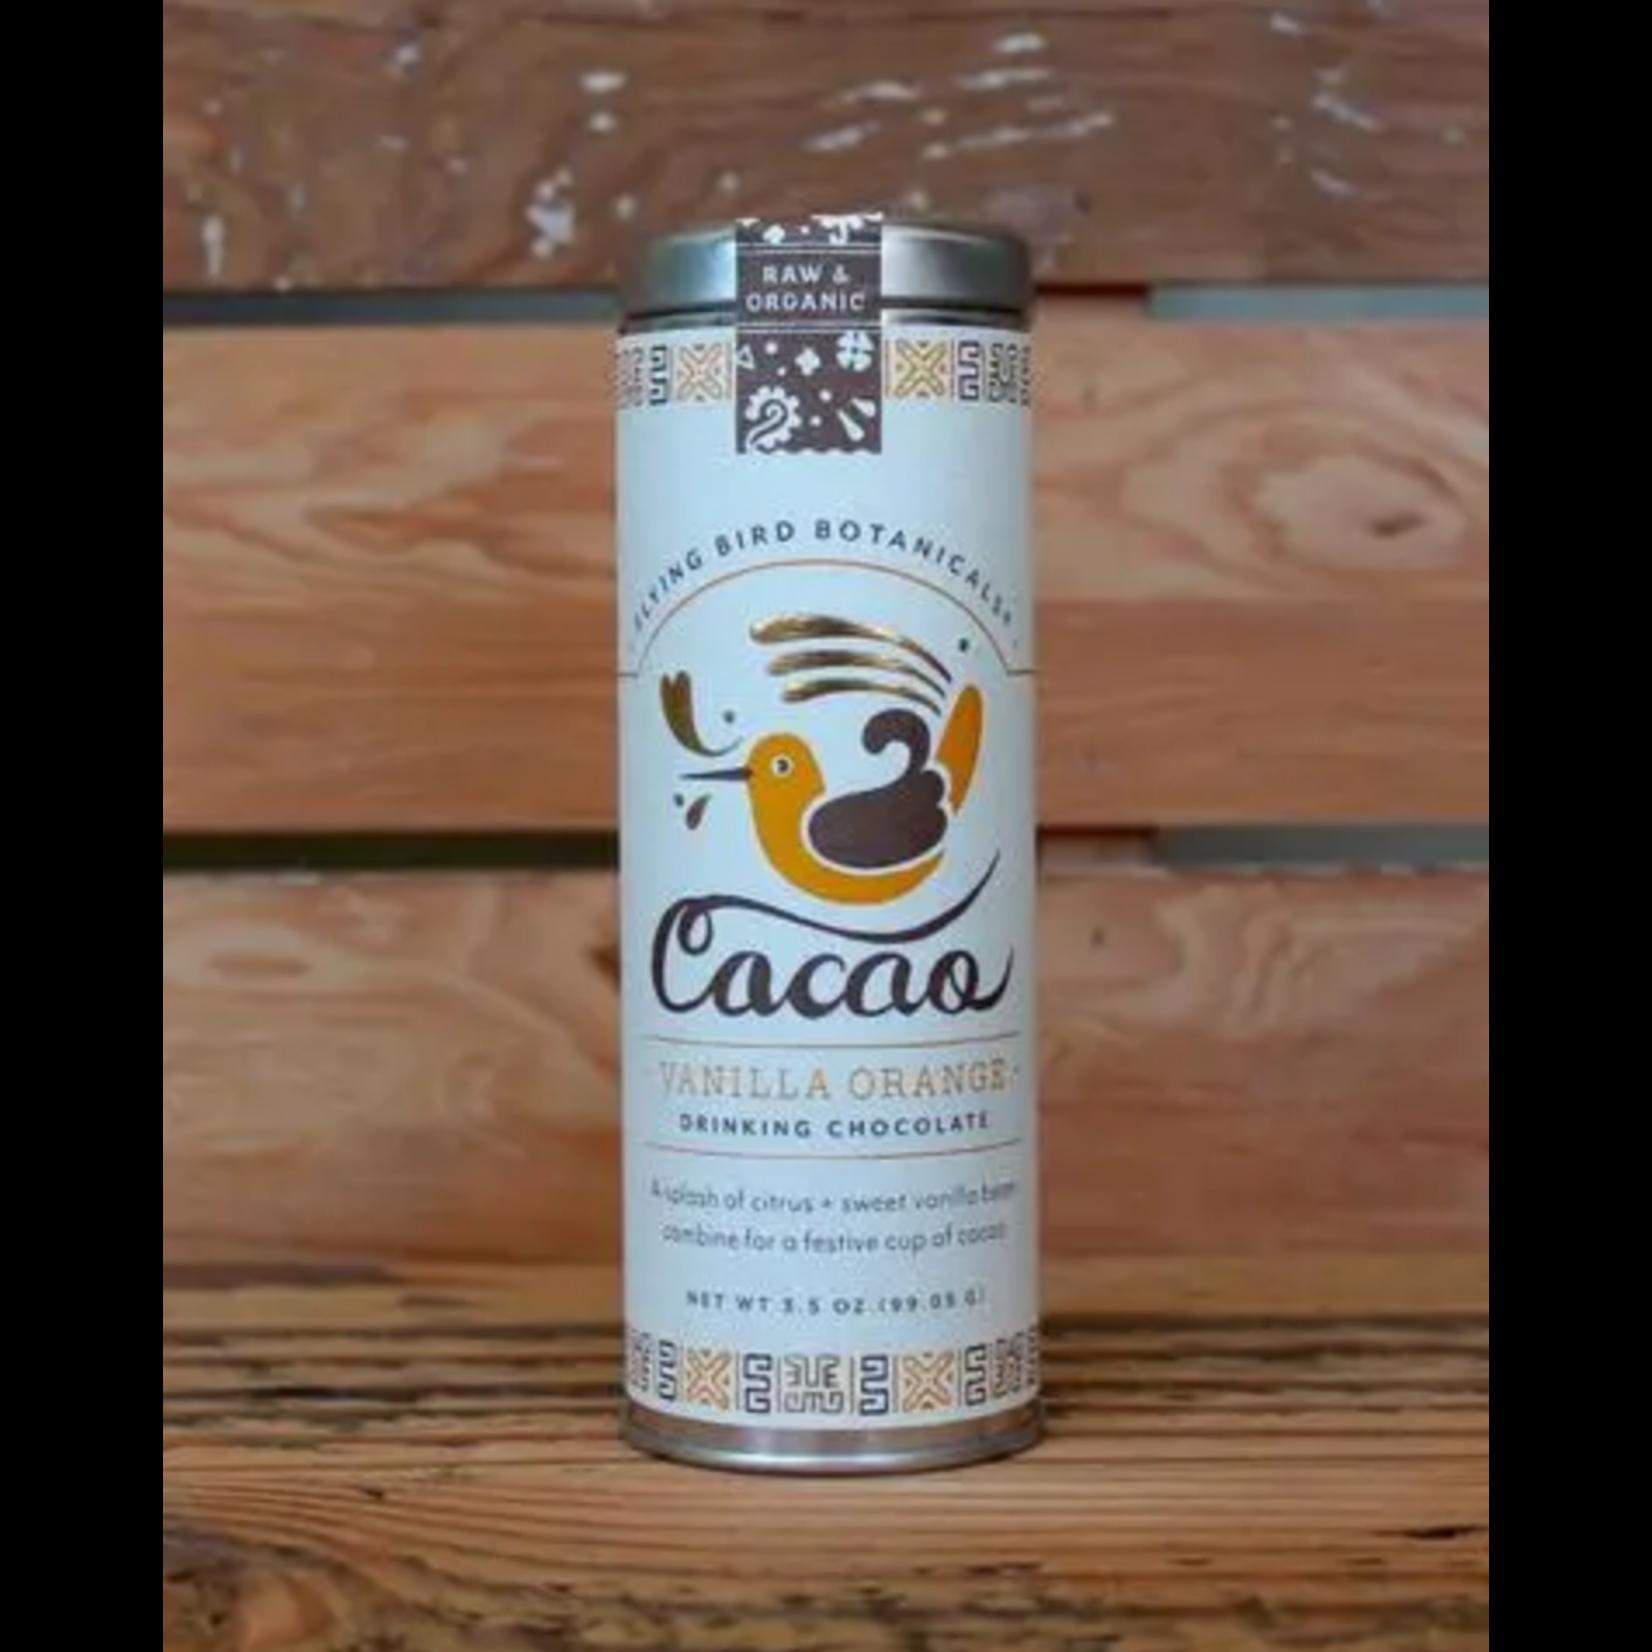 Flying Bird Botanicals Vanilla Orange Cacao Drinking Chocolate Tin